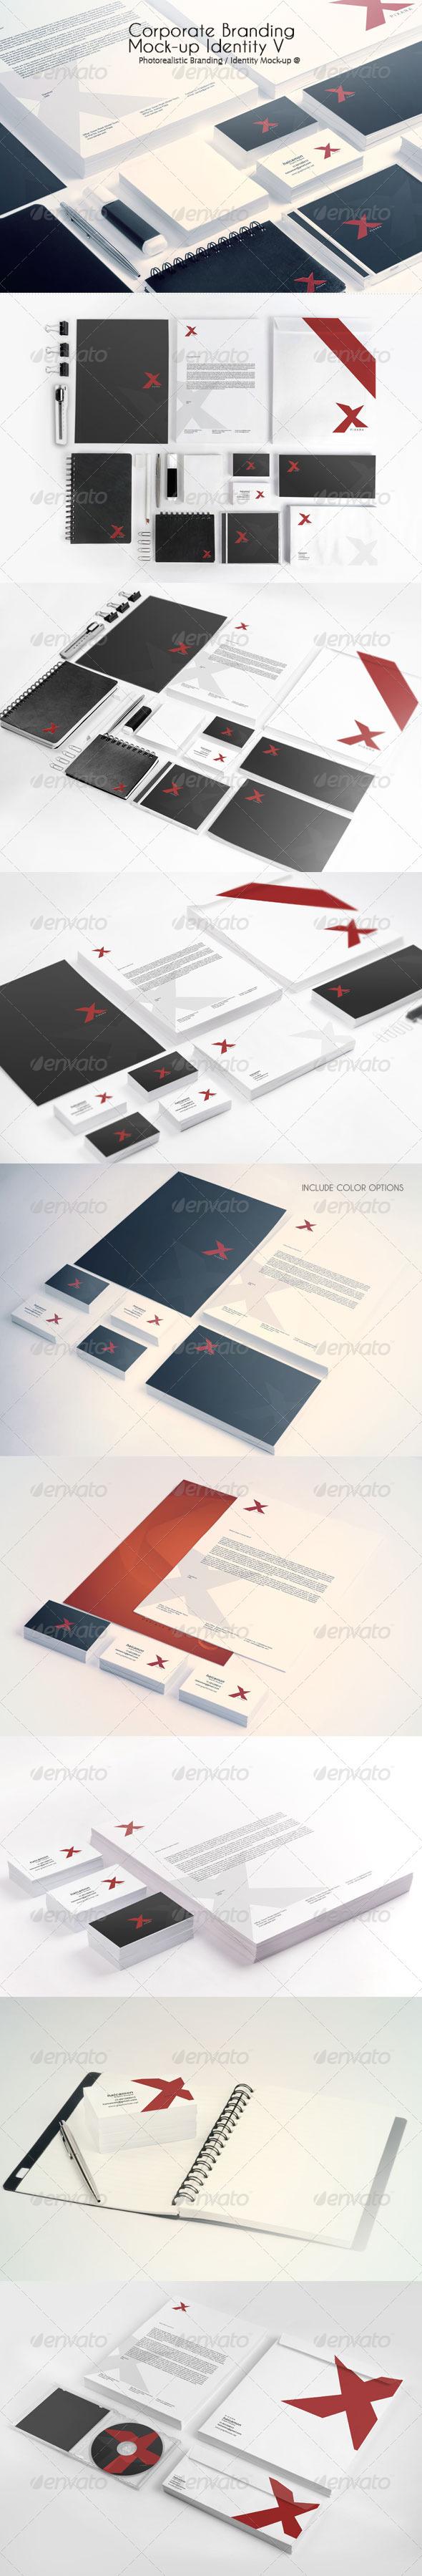 Corporate Branding Mock-up Identity V - Product Mock-Ups Graphics